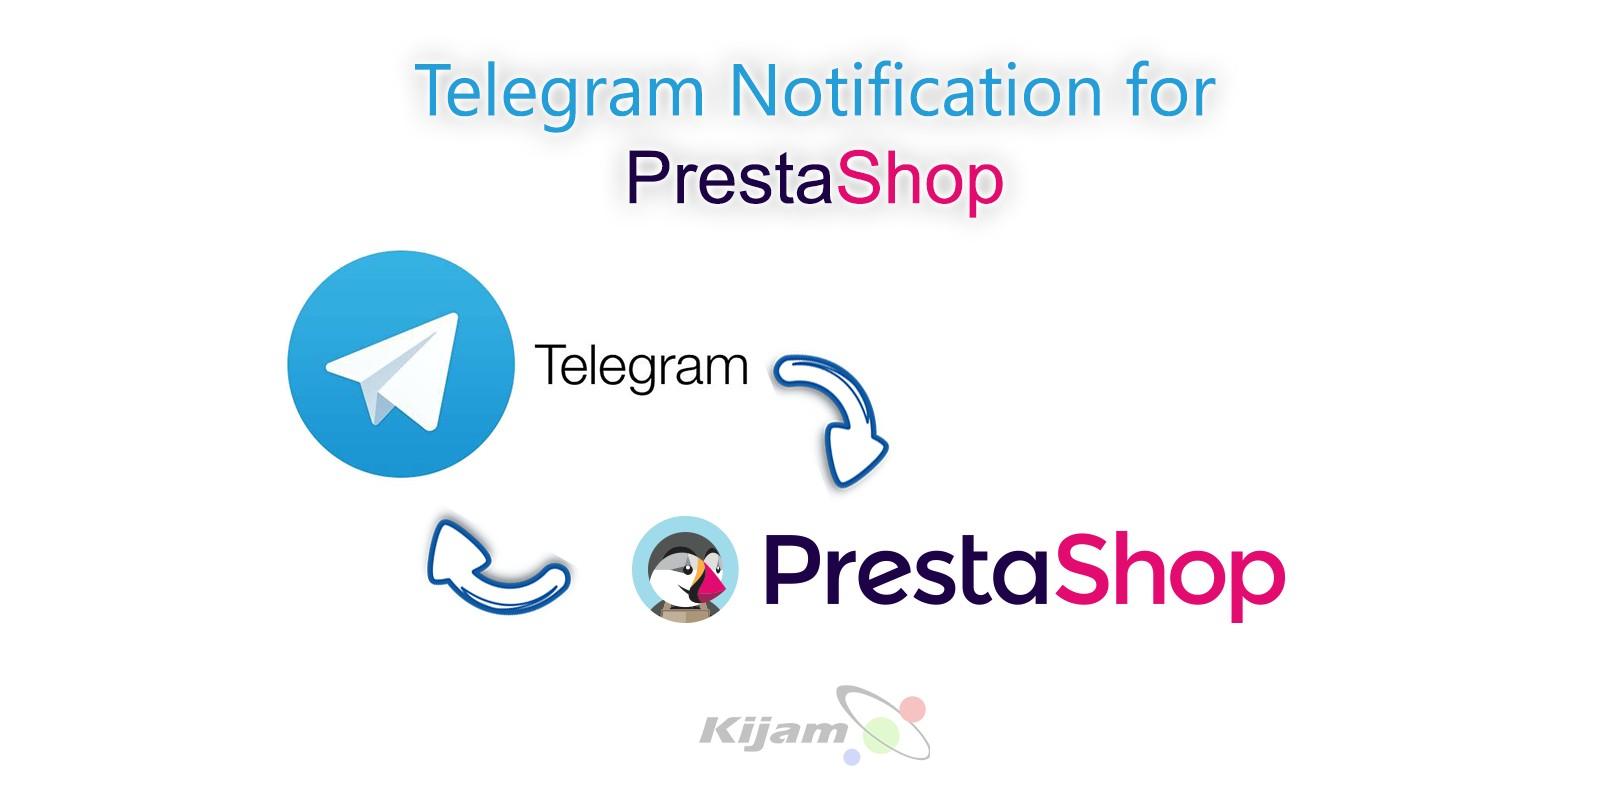 Telegram Notification For Prestashop